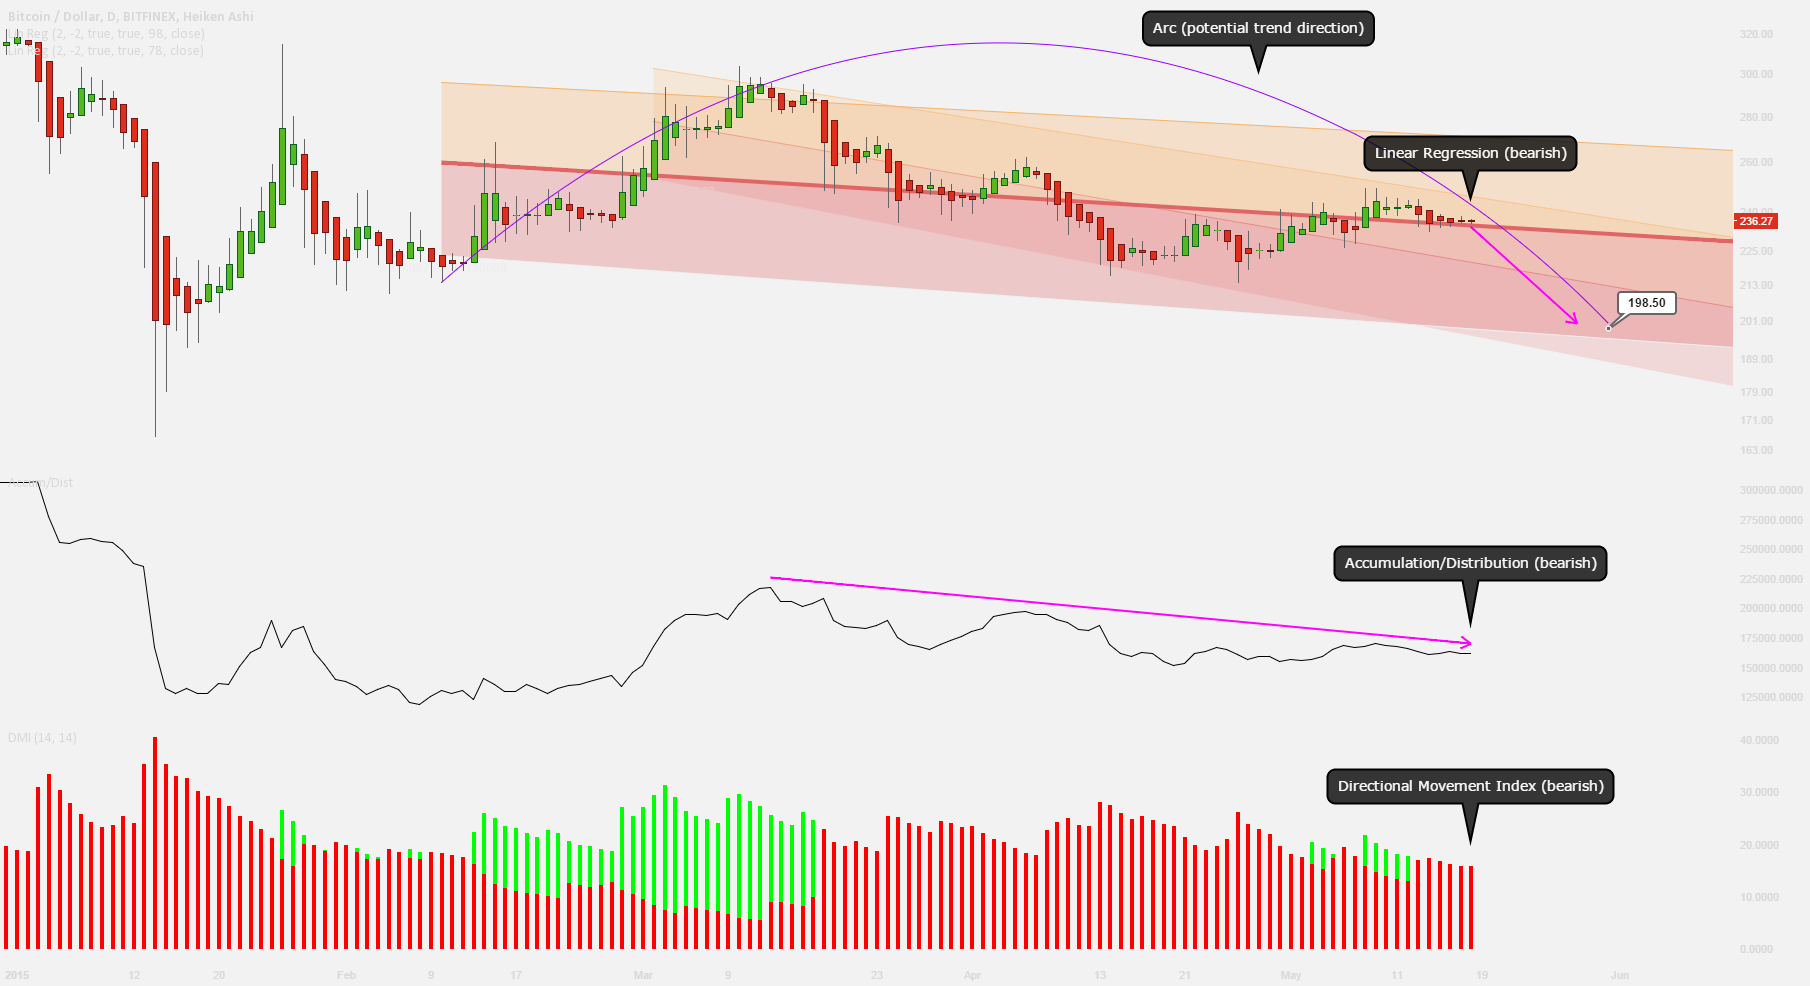 Bearish scenario if the price stays below 240 USD